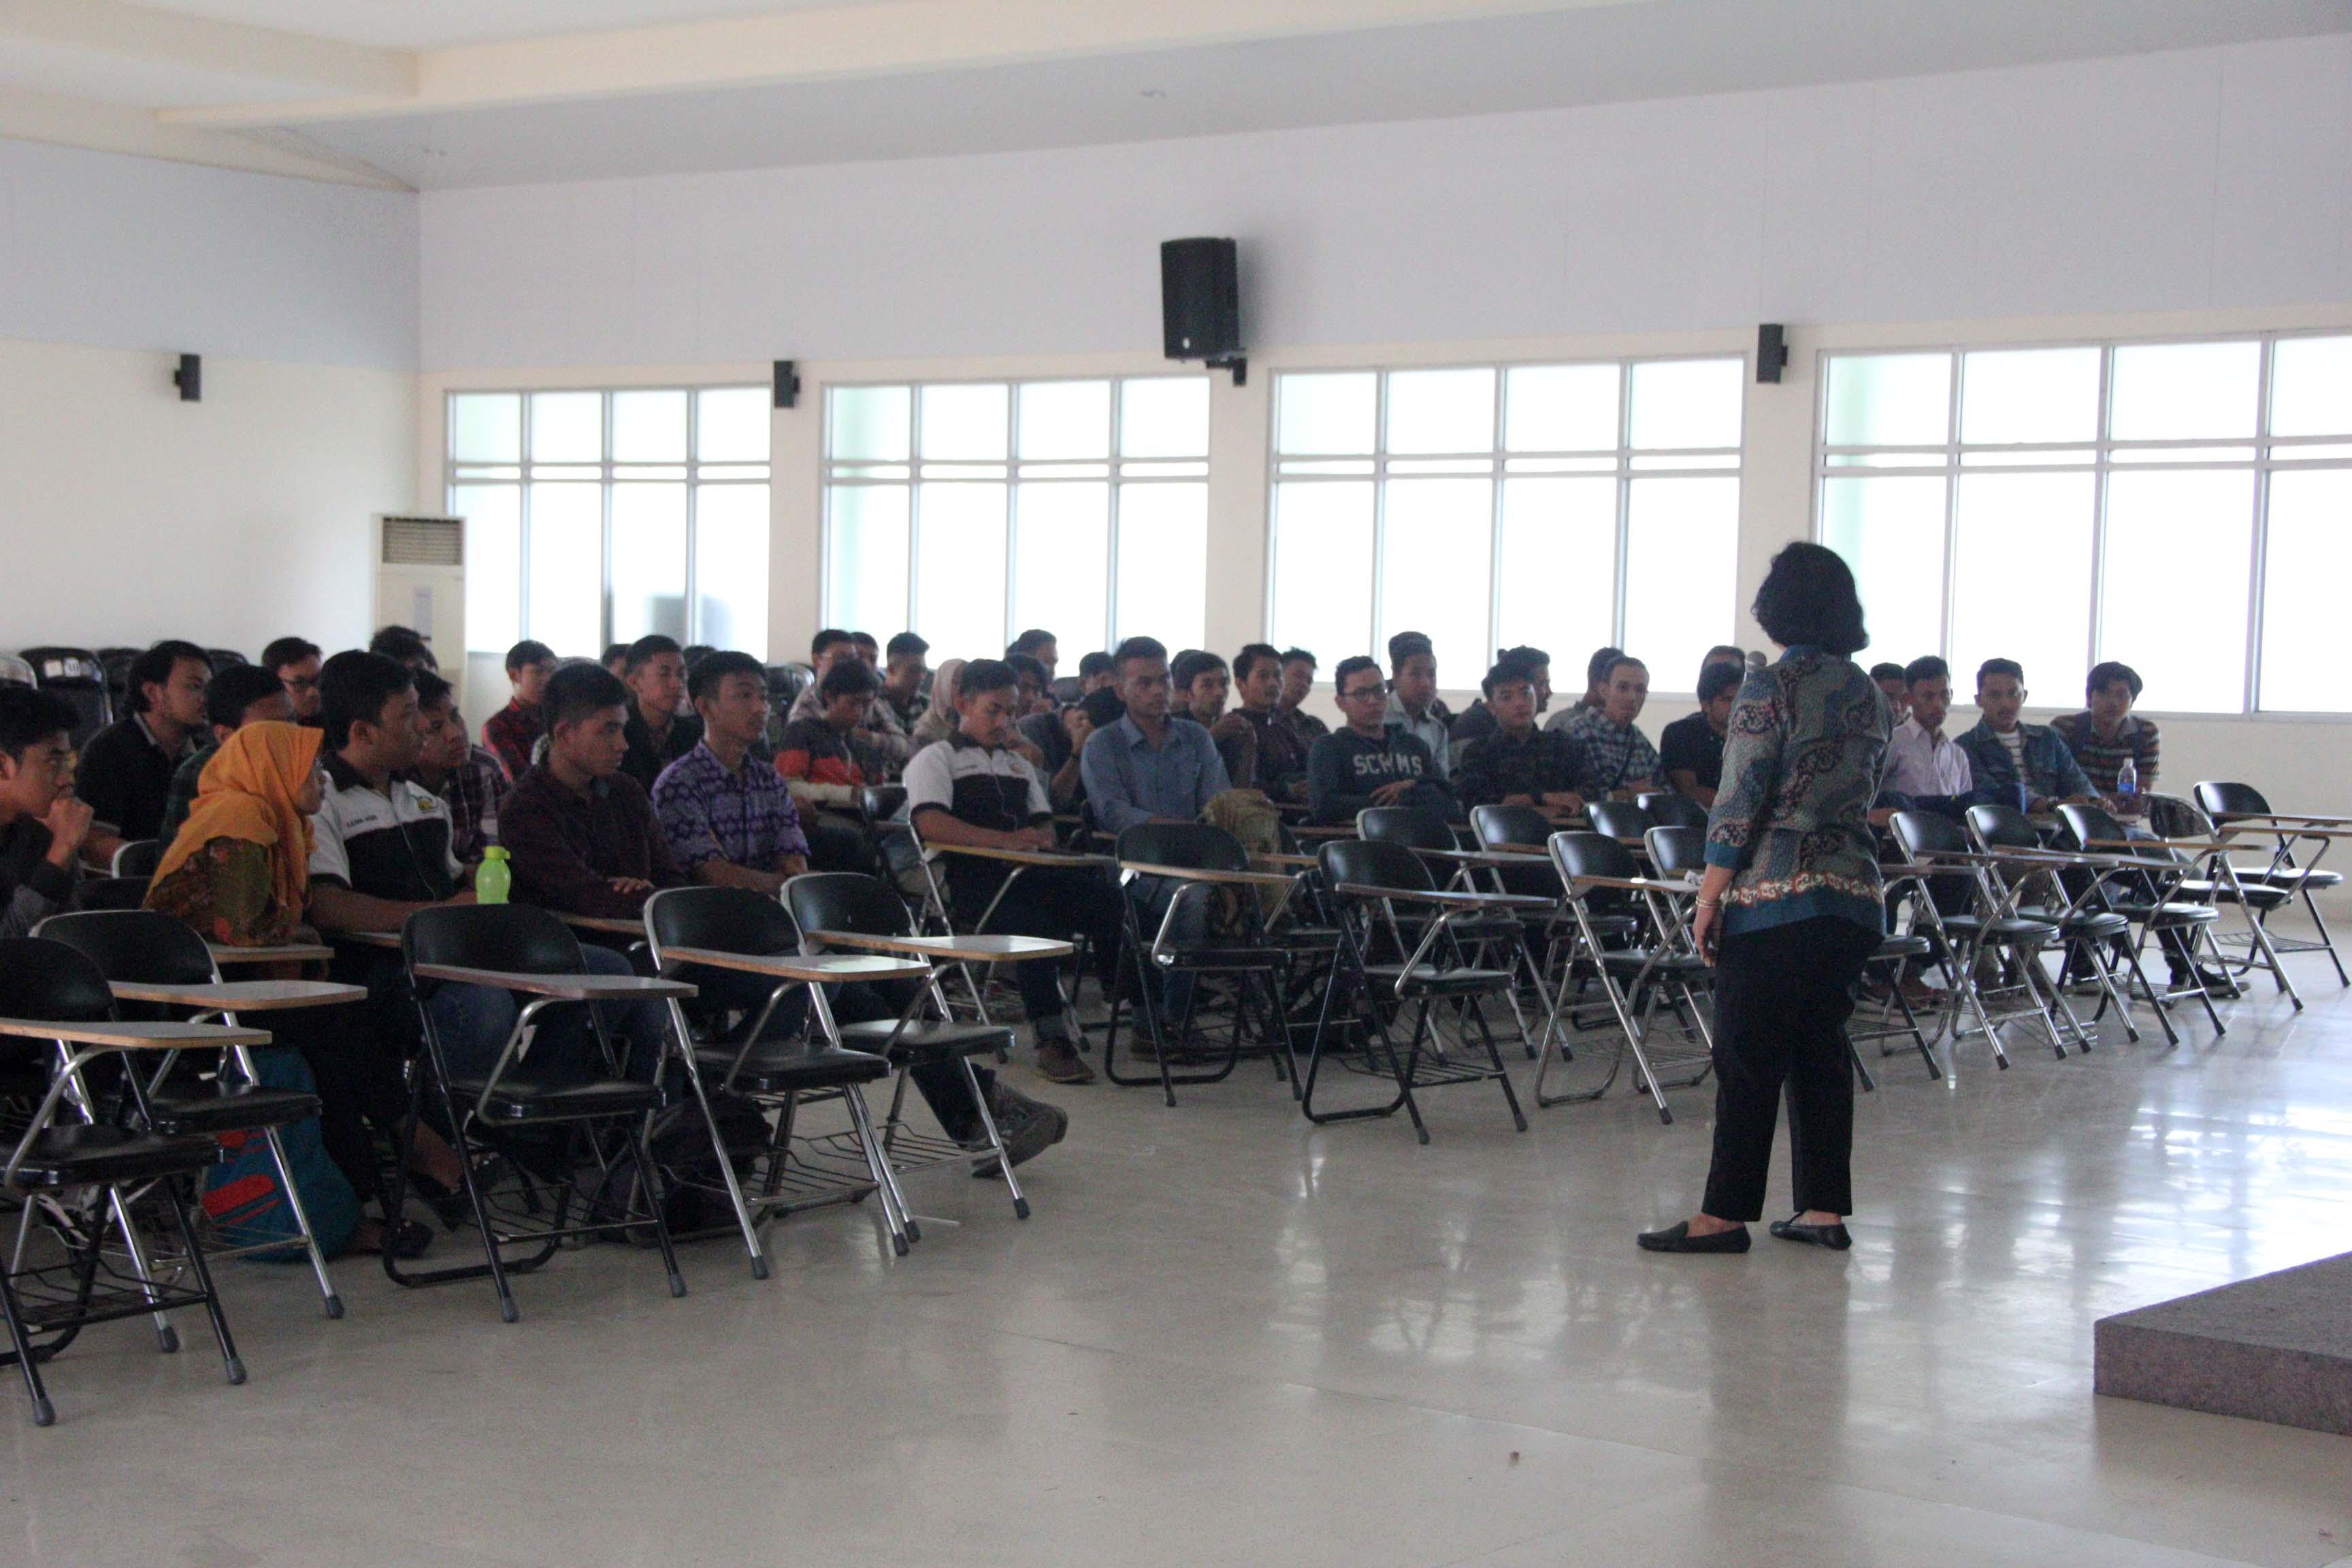 Technical meeting kunjungan pabrik jurusan teknik industri IST AKPRIND dipandu oleh Ir. Risma A Simanjuntak,MT